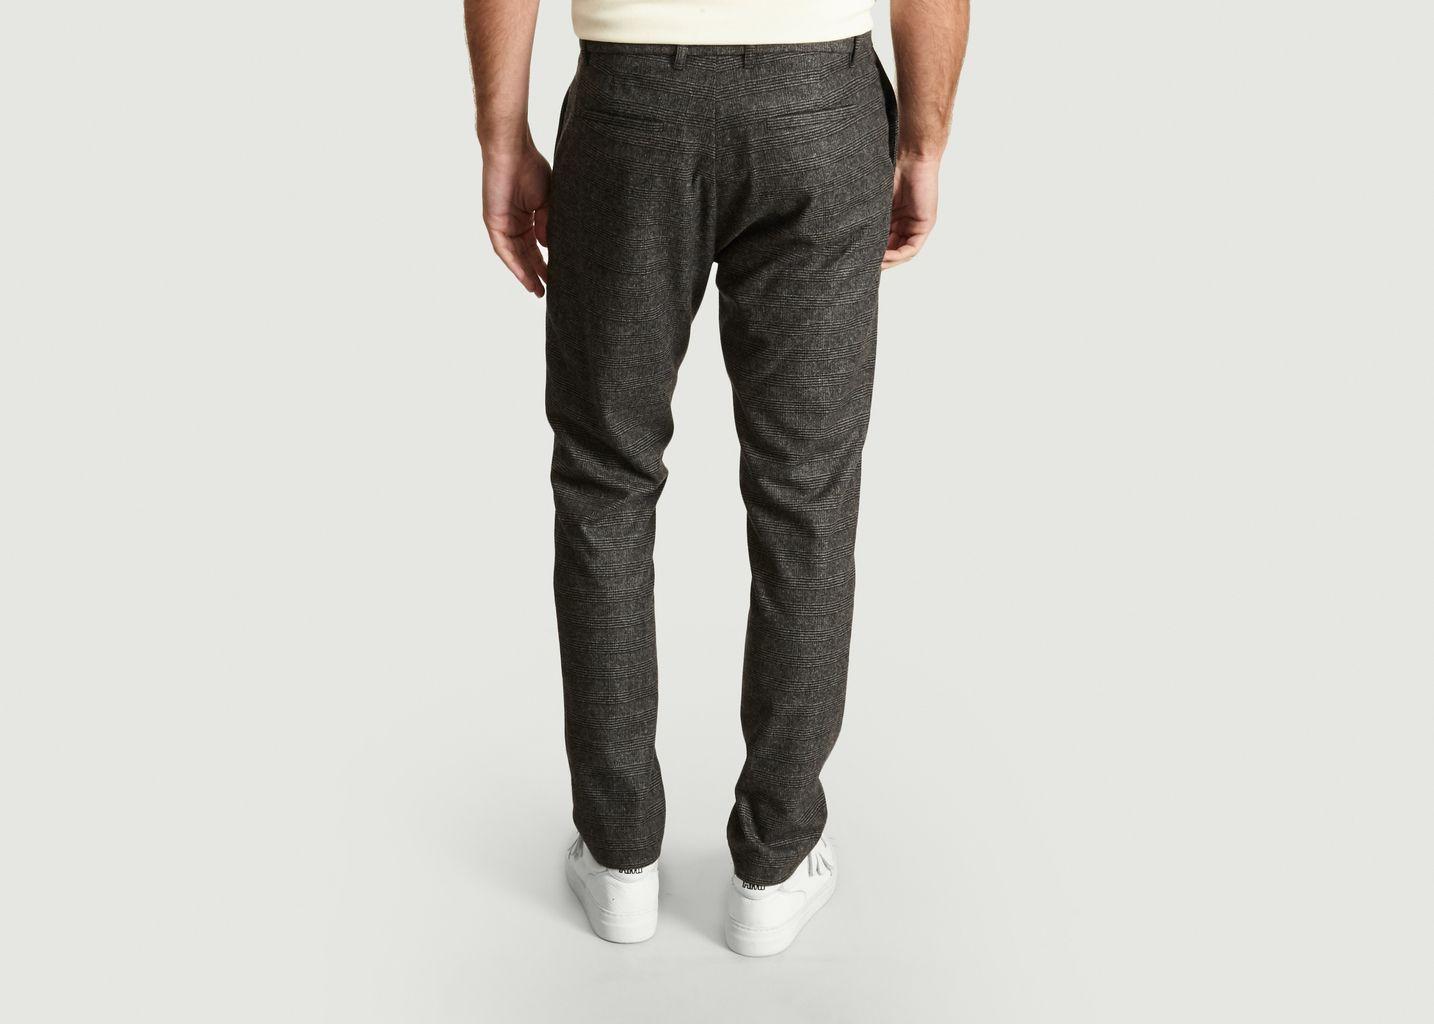 Pantalon Motif Prince De Galles Andy - Samsoe Samsoe